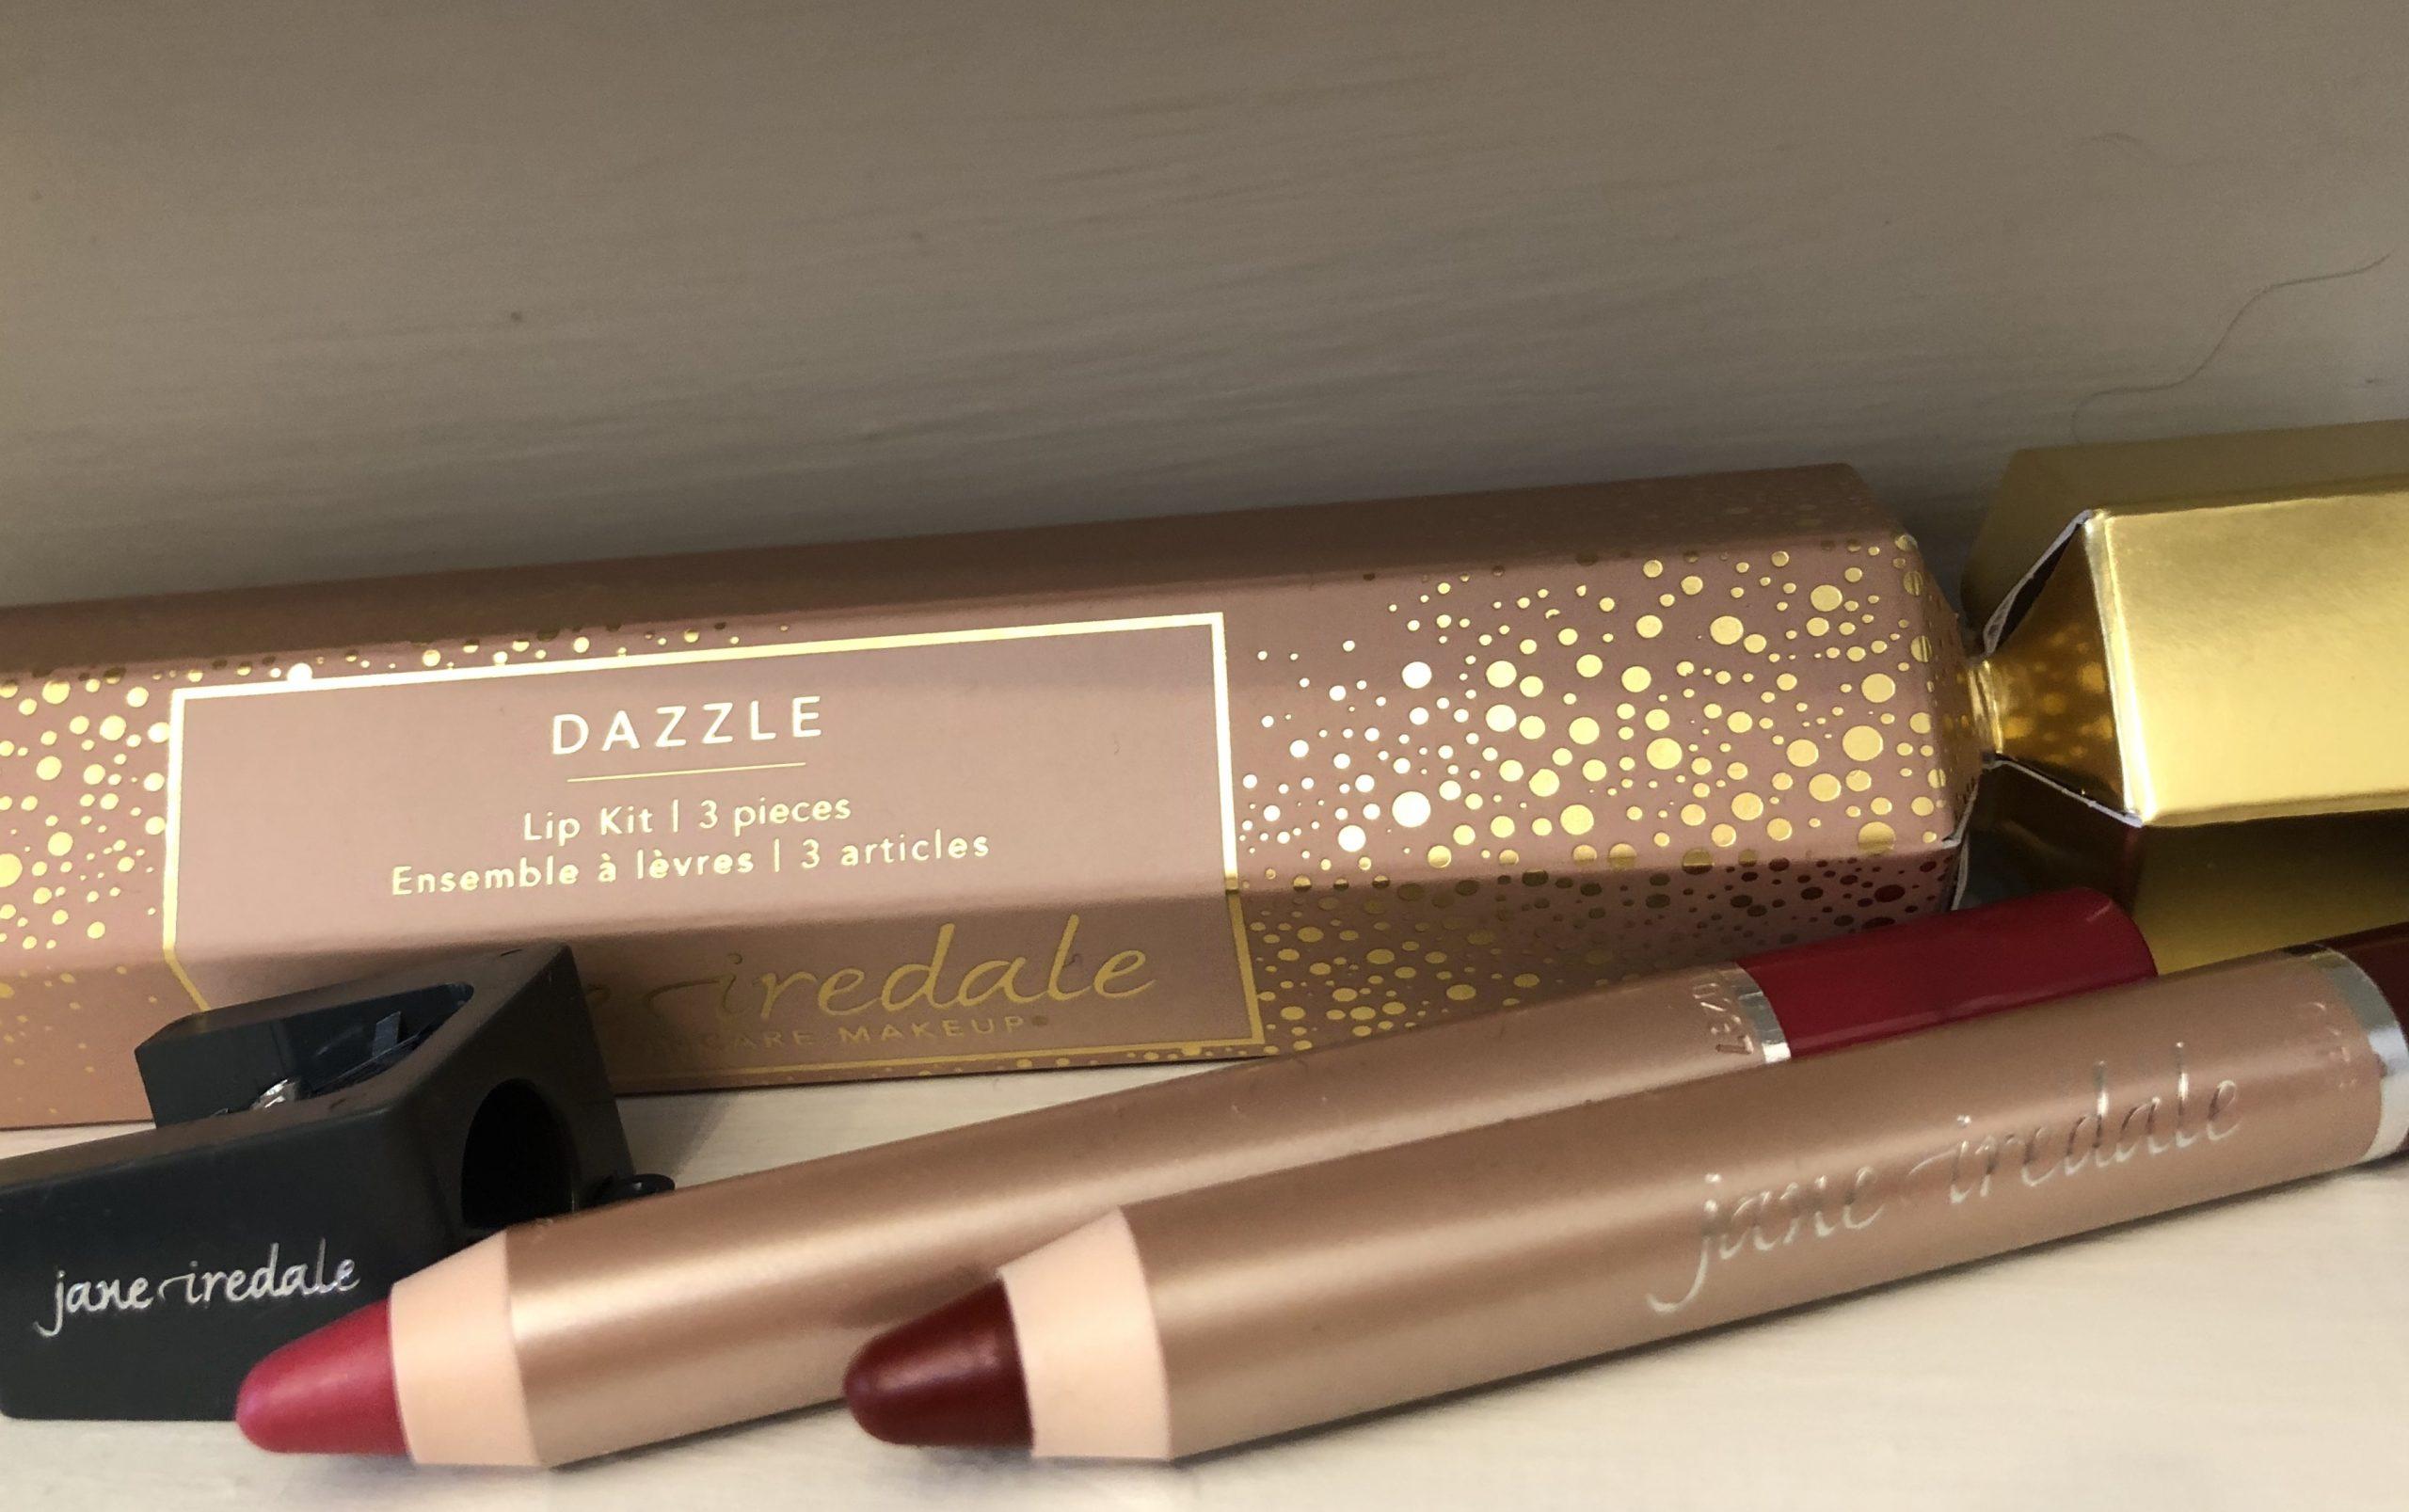 Jane Iredale Dazzle Lip Kit